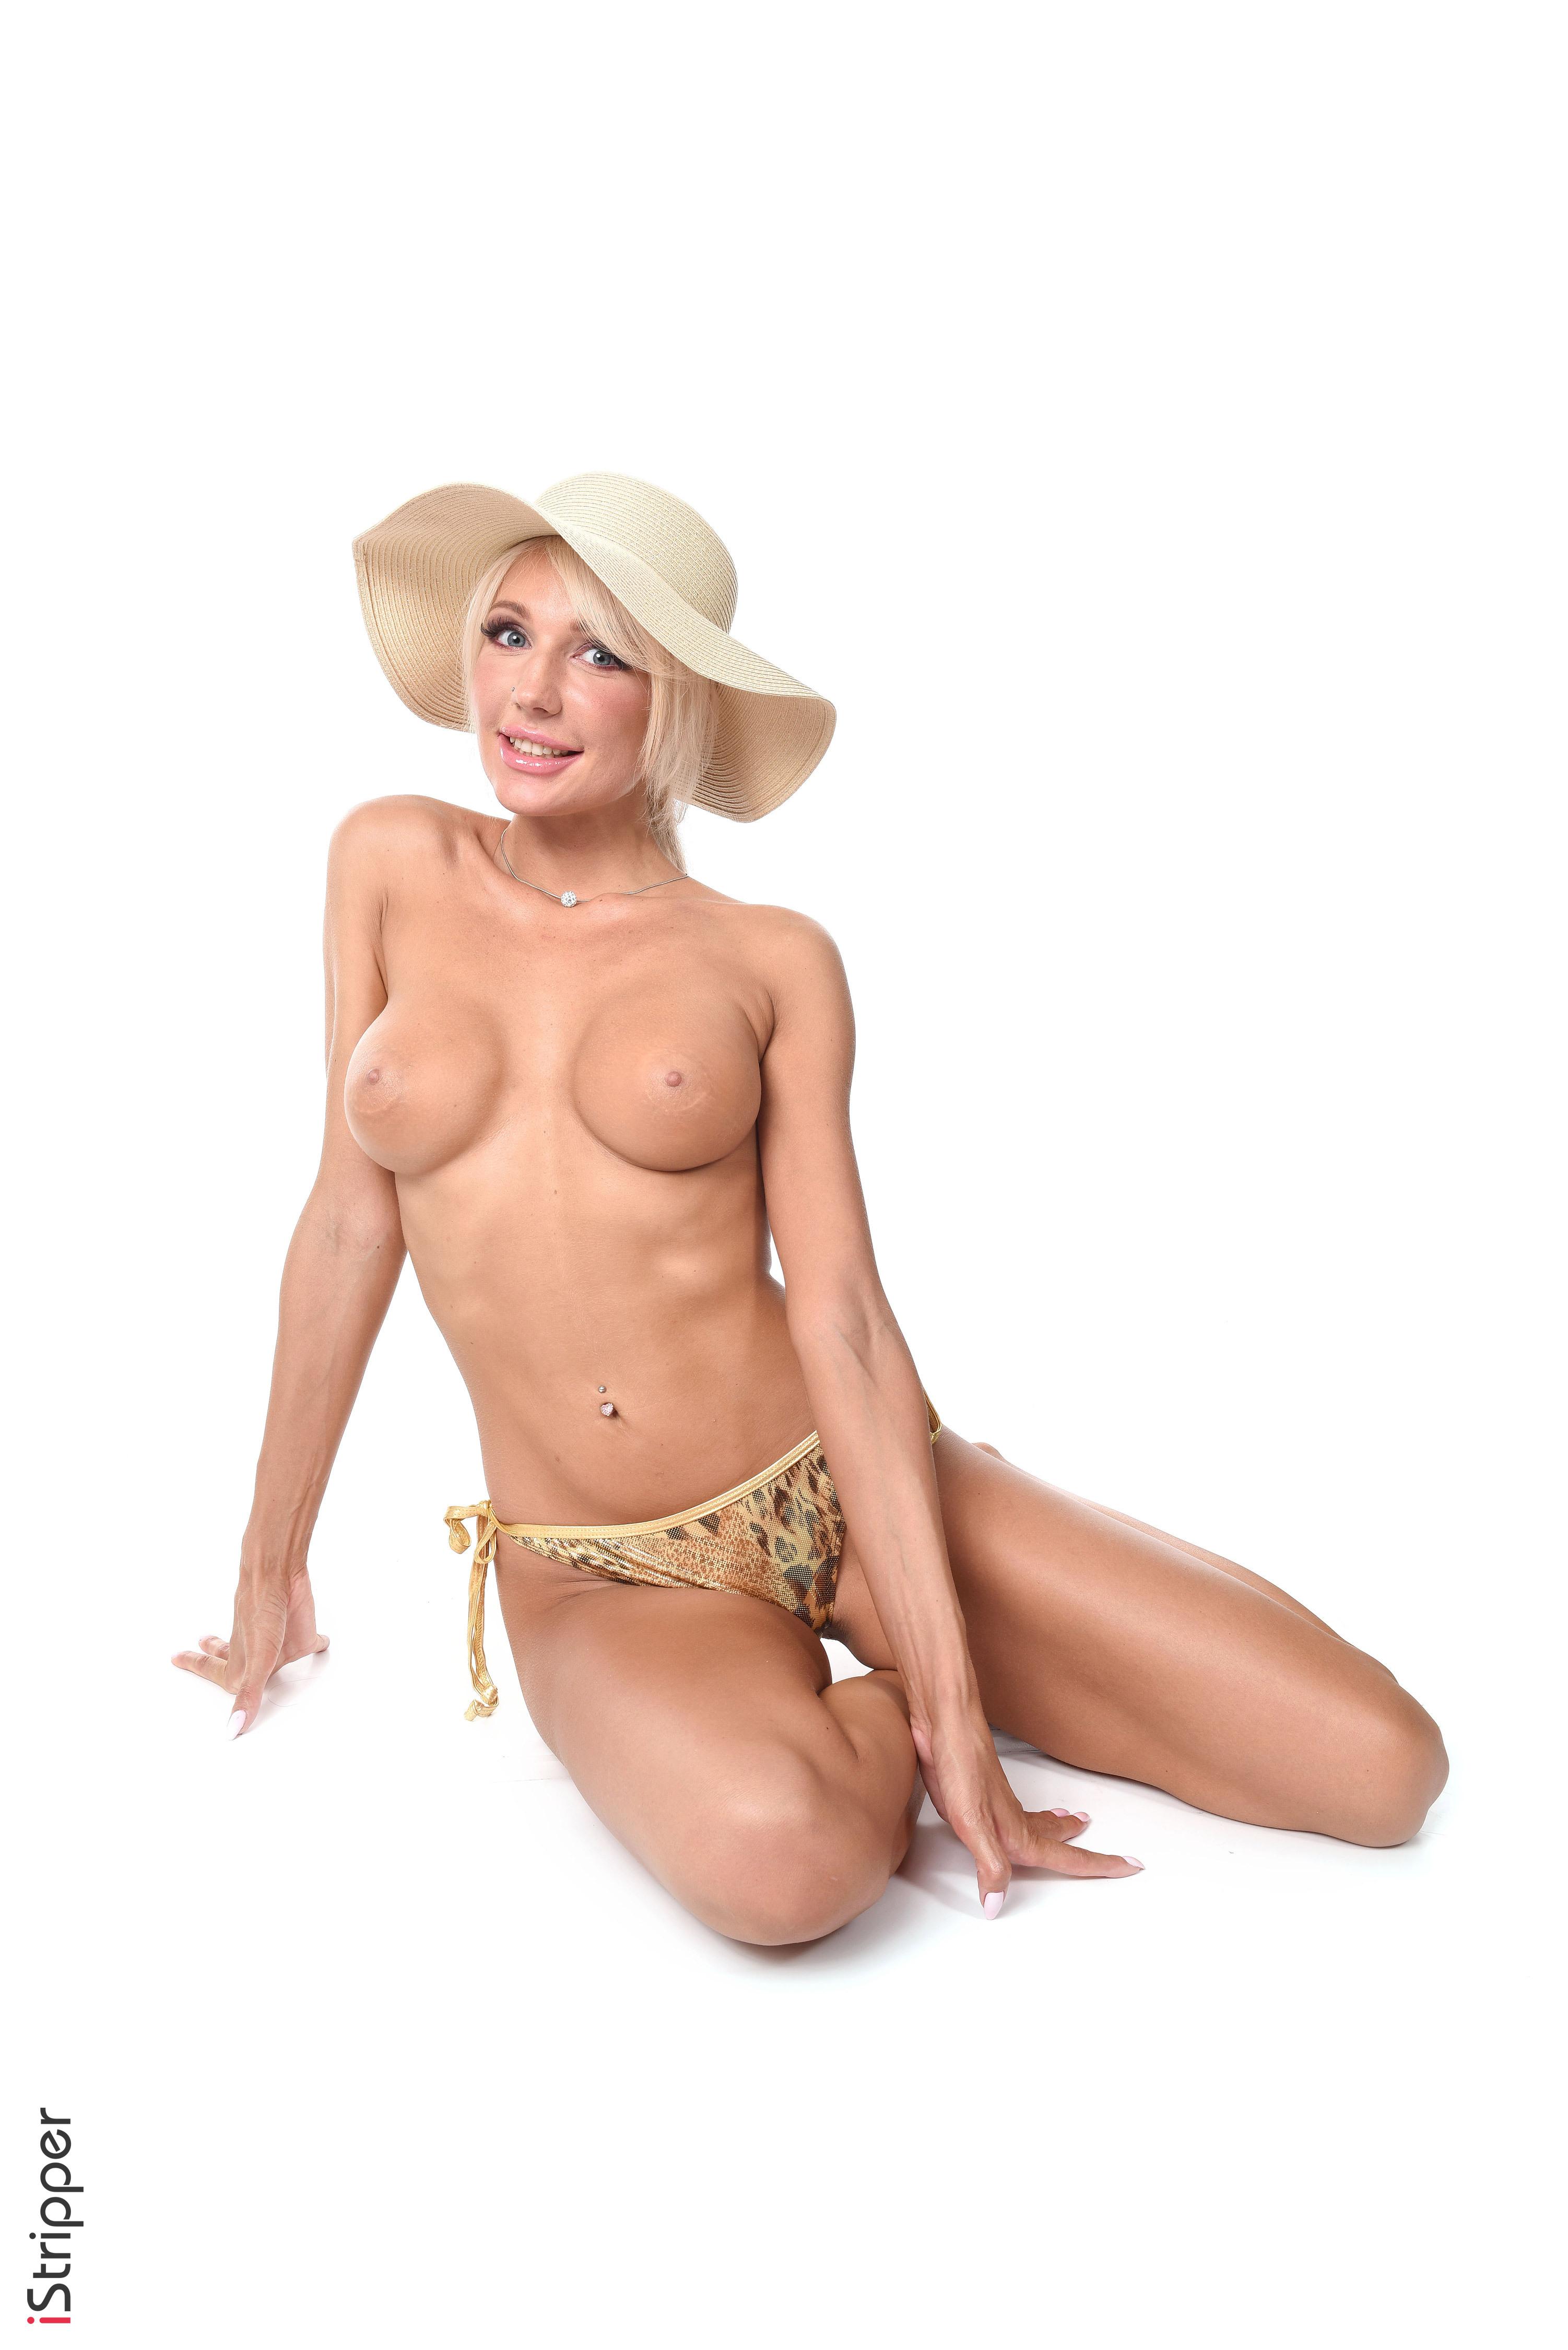 free Bare Big tittied women wallpaper